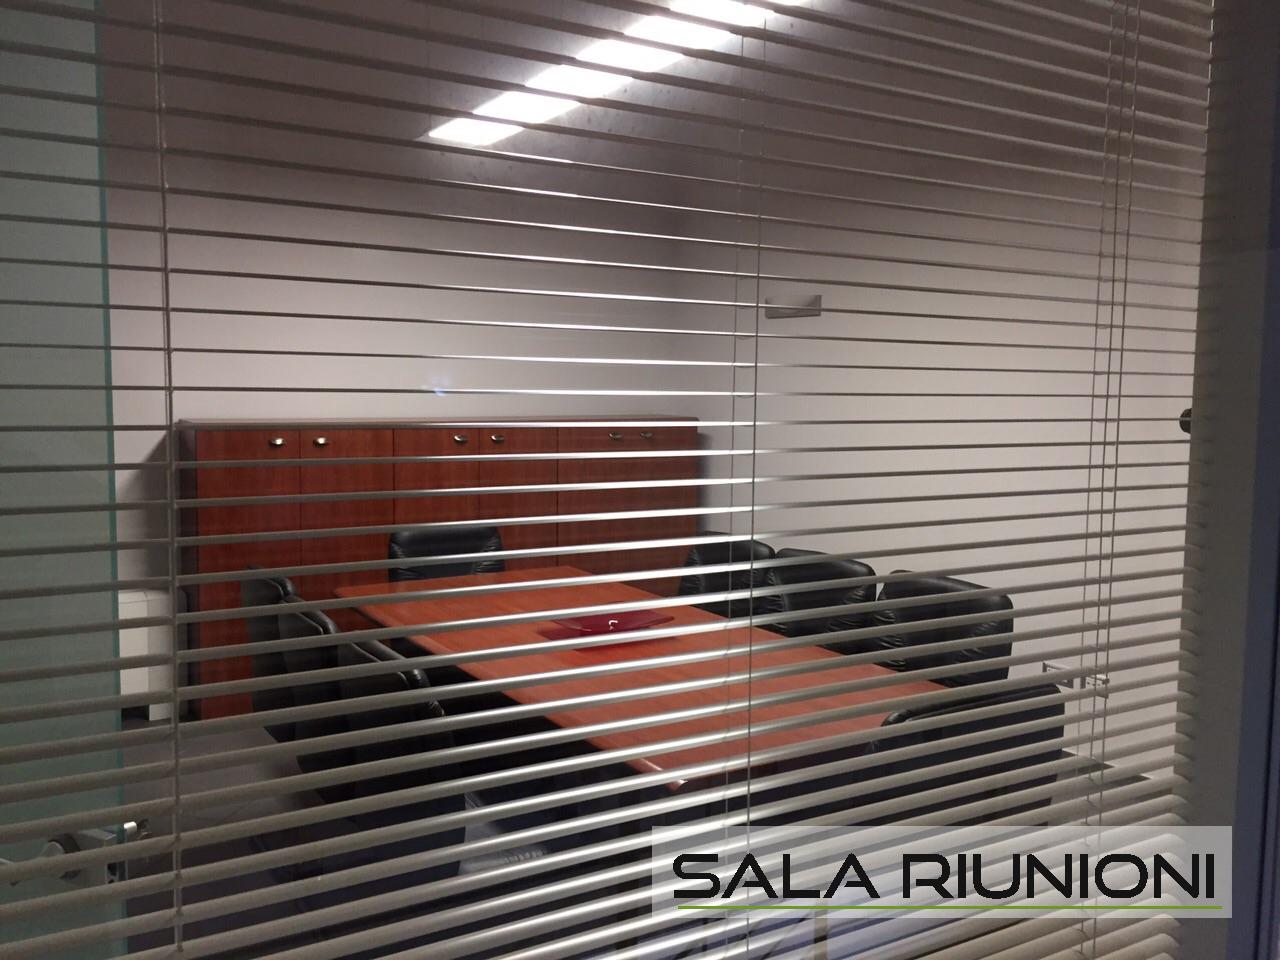 sala riunioni affitto